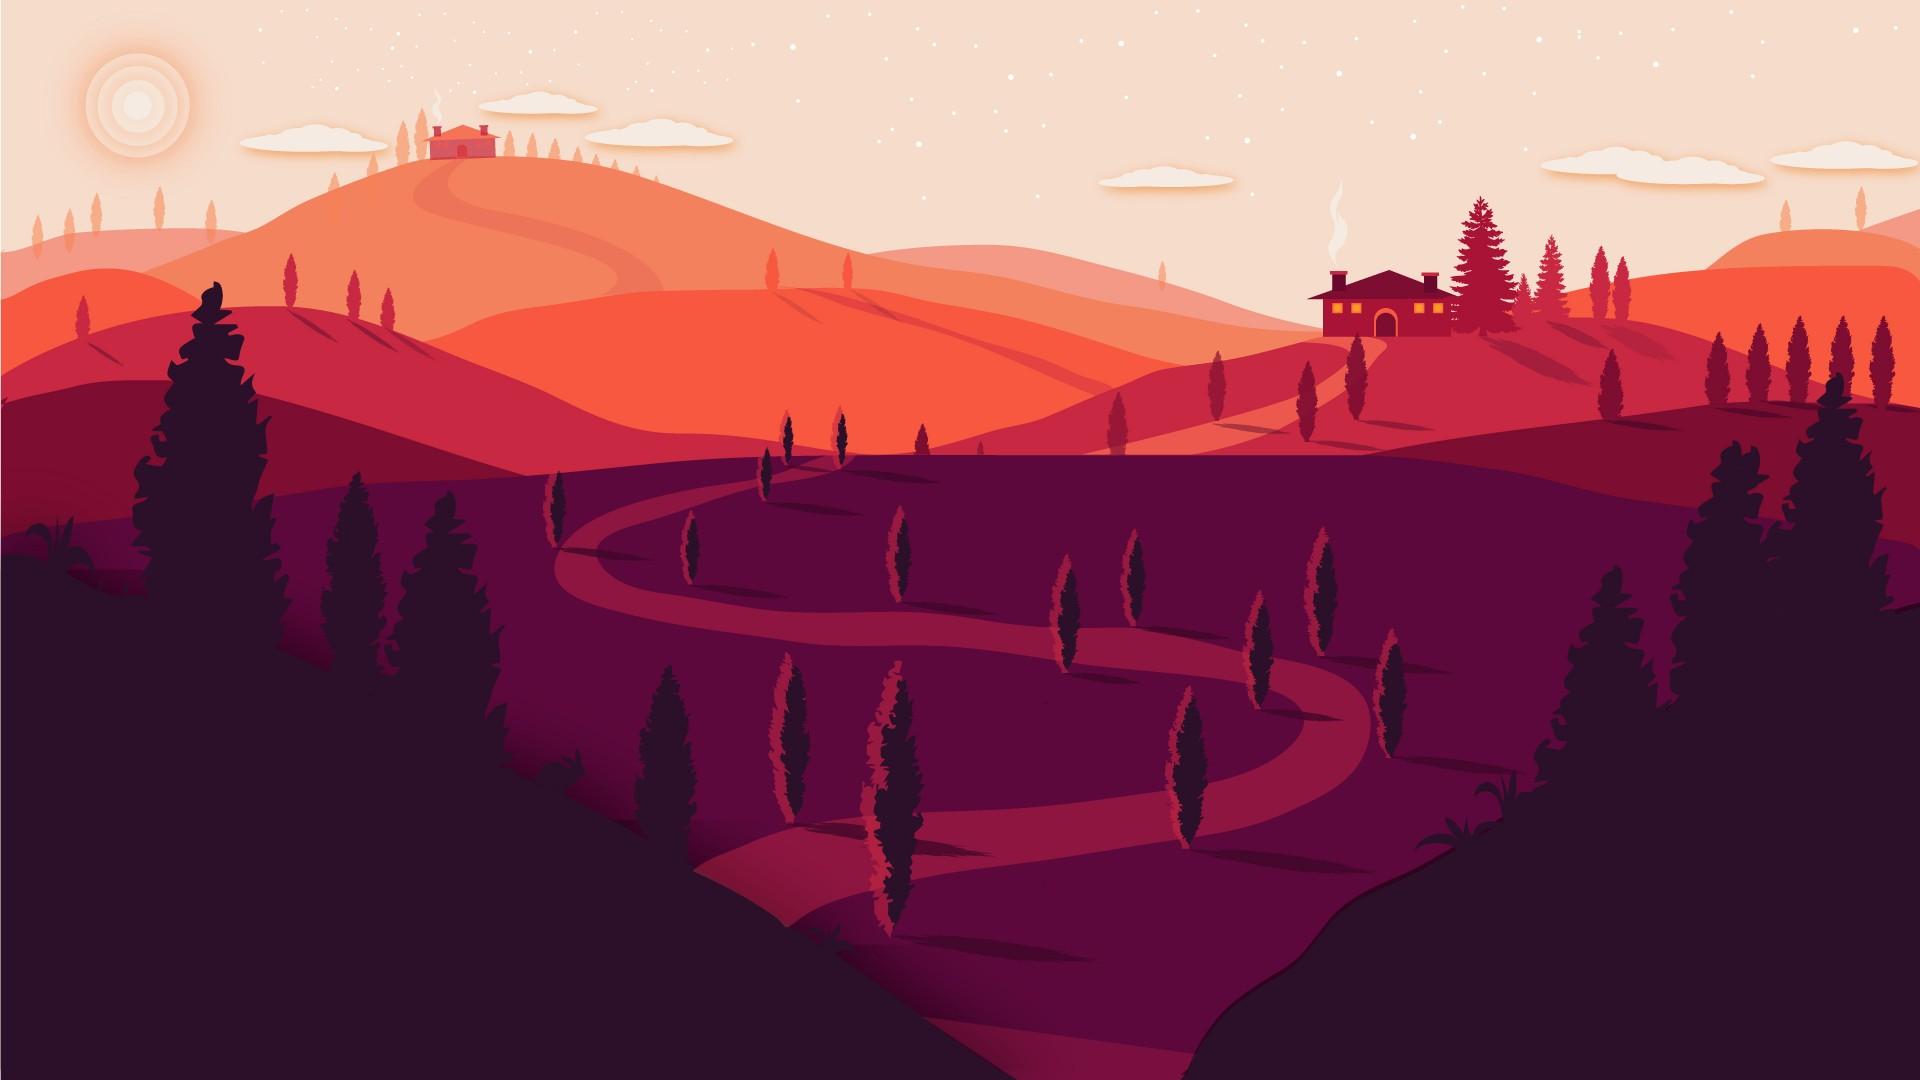 Pixel Forest Wallpaper Cute Summer Landscape Minimal 4k Wallpapers Hd Wallpapers